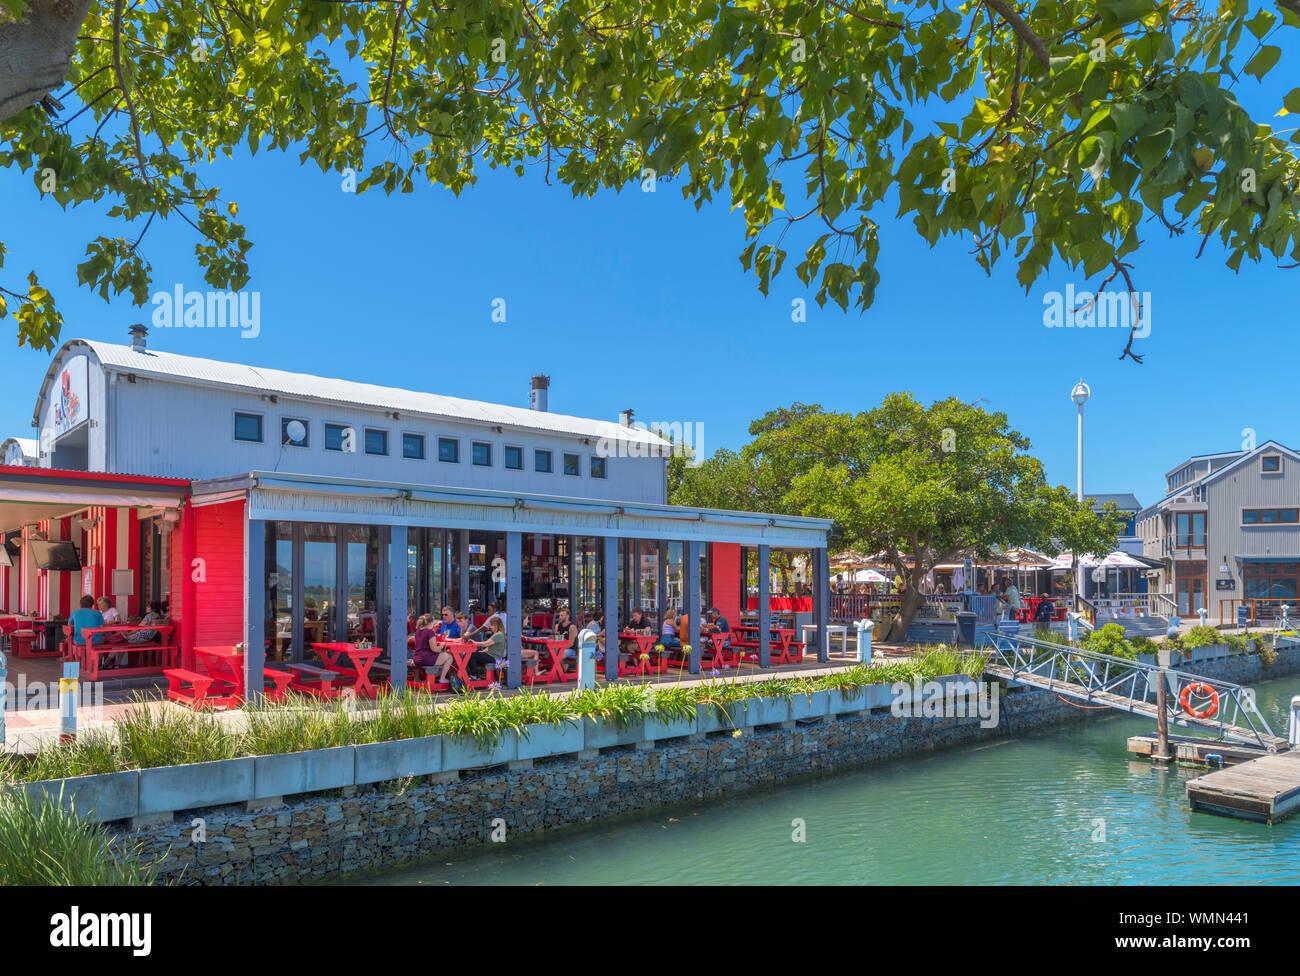 Waterfront restaurant on Thesen Island, Knysna, Garden Route, Western Cape, South Africa Stock Photo